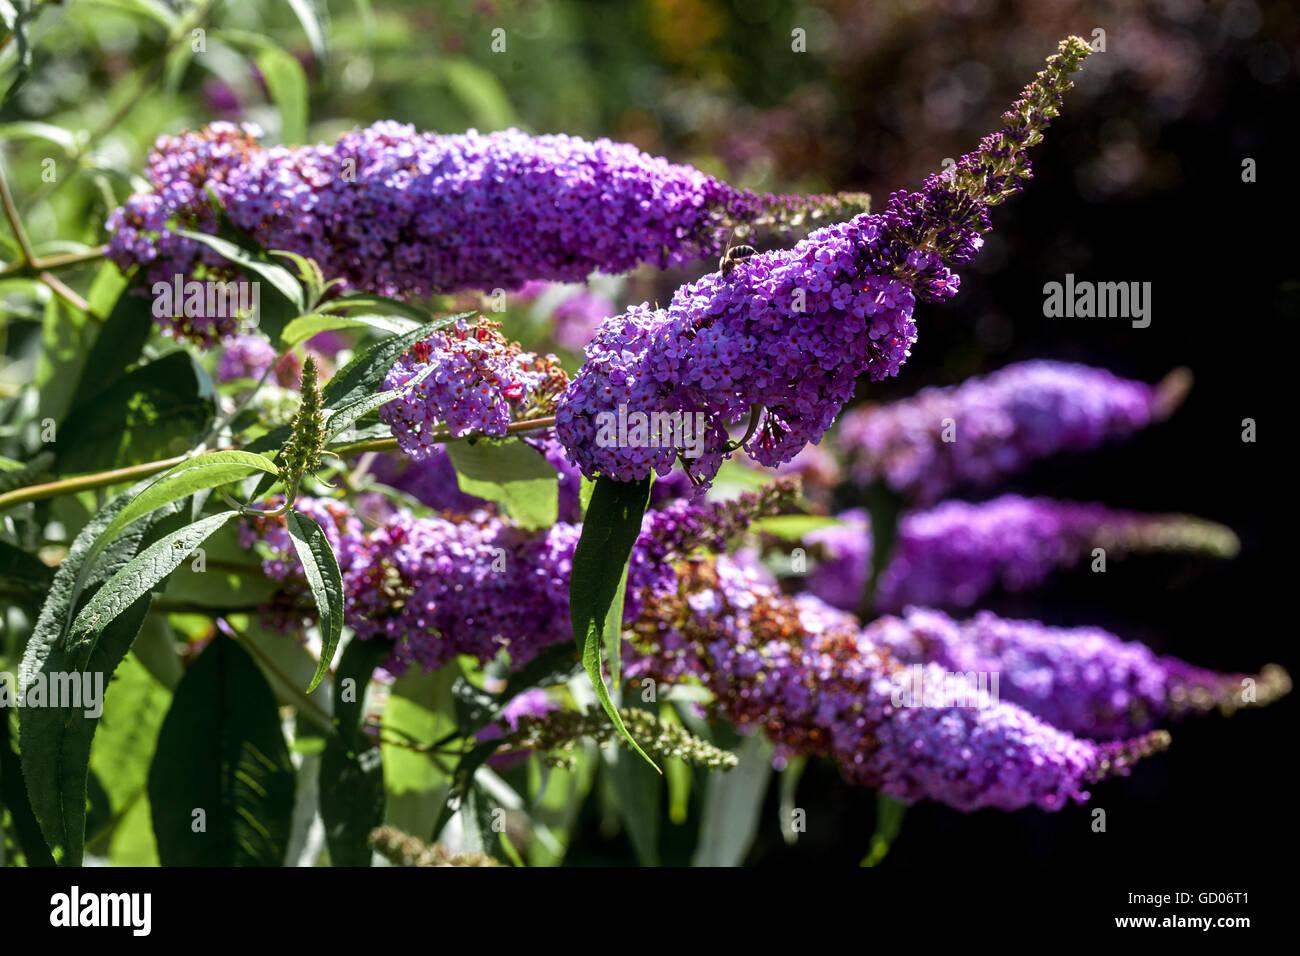 Strauch Grenze Garten, Schmetterling Bush Buddleja davidii Stockbild